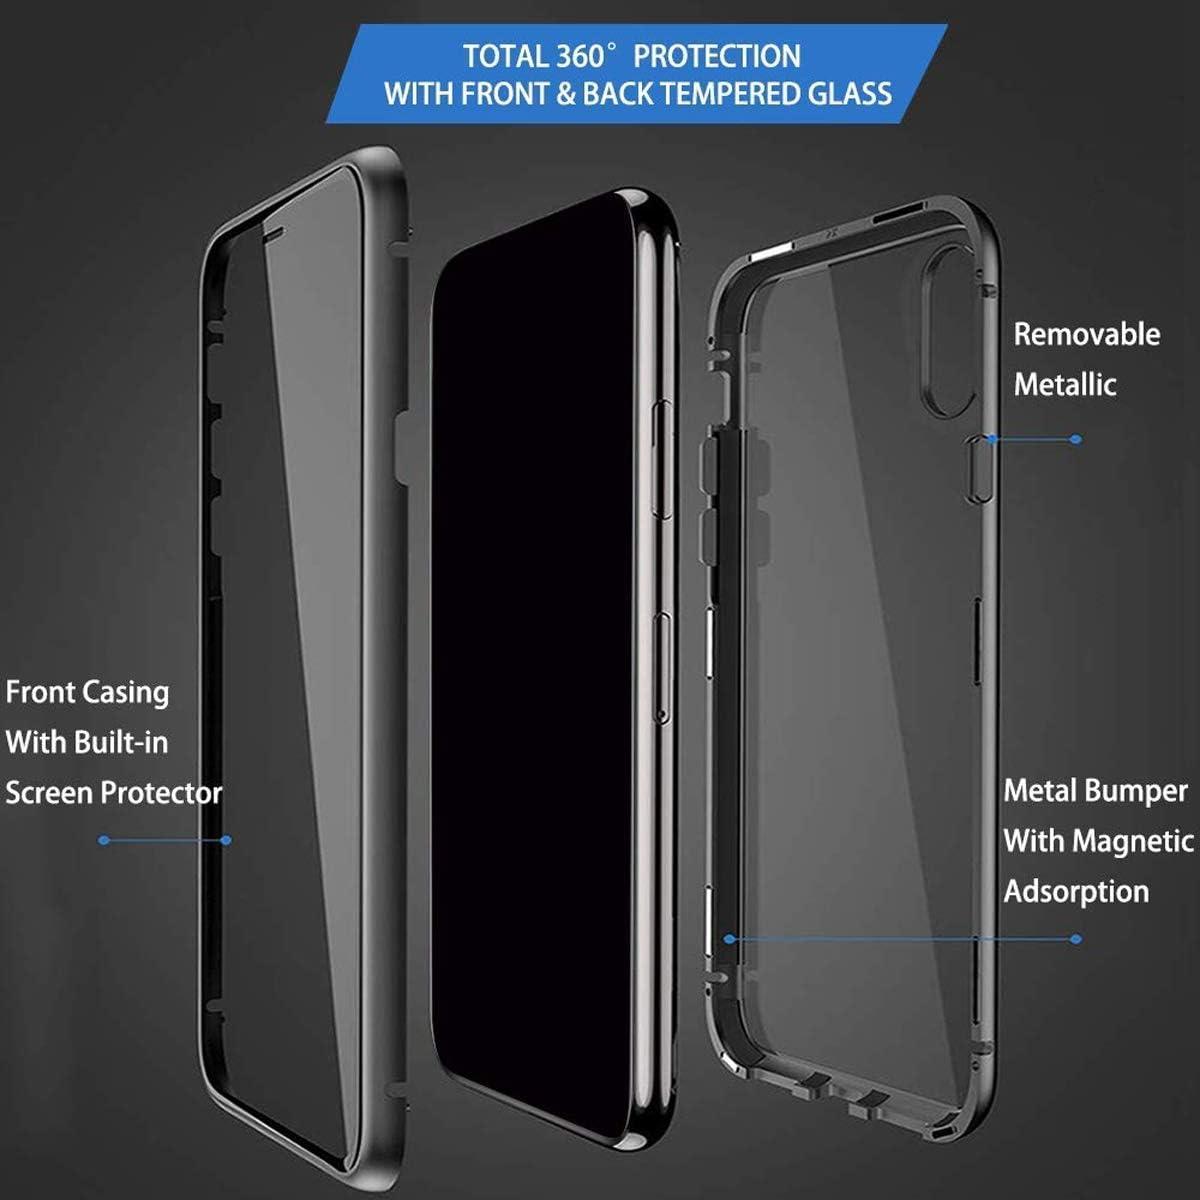 Funda para Samsung Galaxy S20 FE 5G// Samsung S20 Lite Carcasa Adsorci/ón Magn/ética Parachoques de Metal con 360 Grados Protecci/ón Case Transparente Ambos Lados Vidrio Templado Cubierta Cover Plata